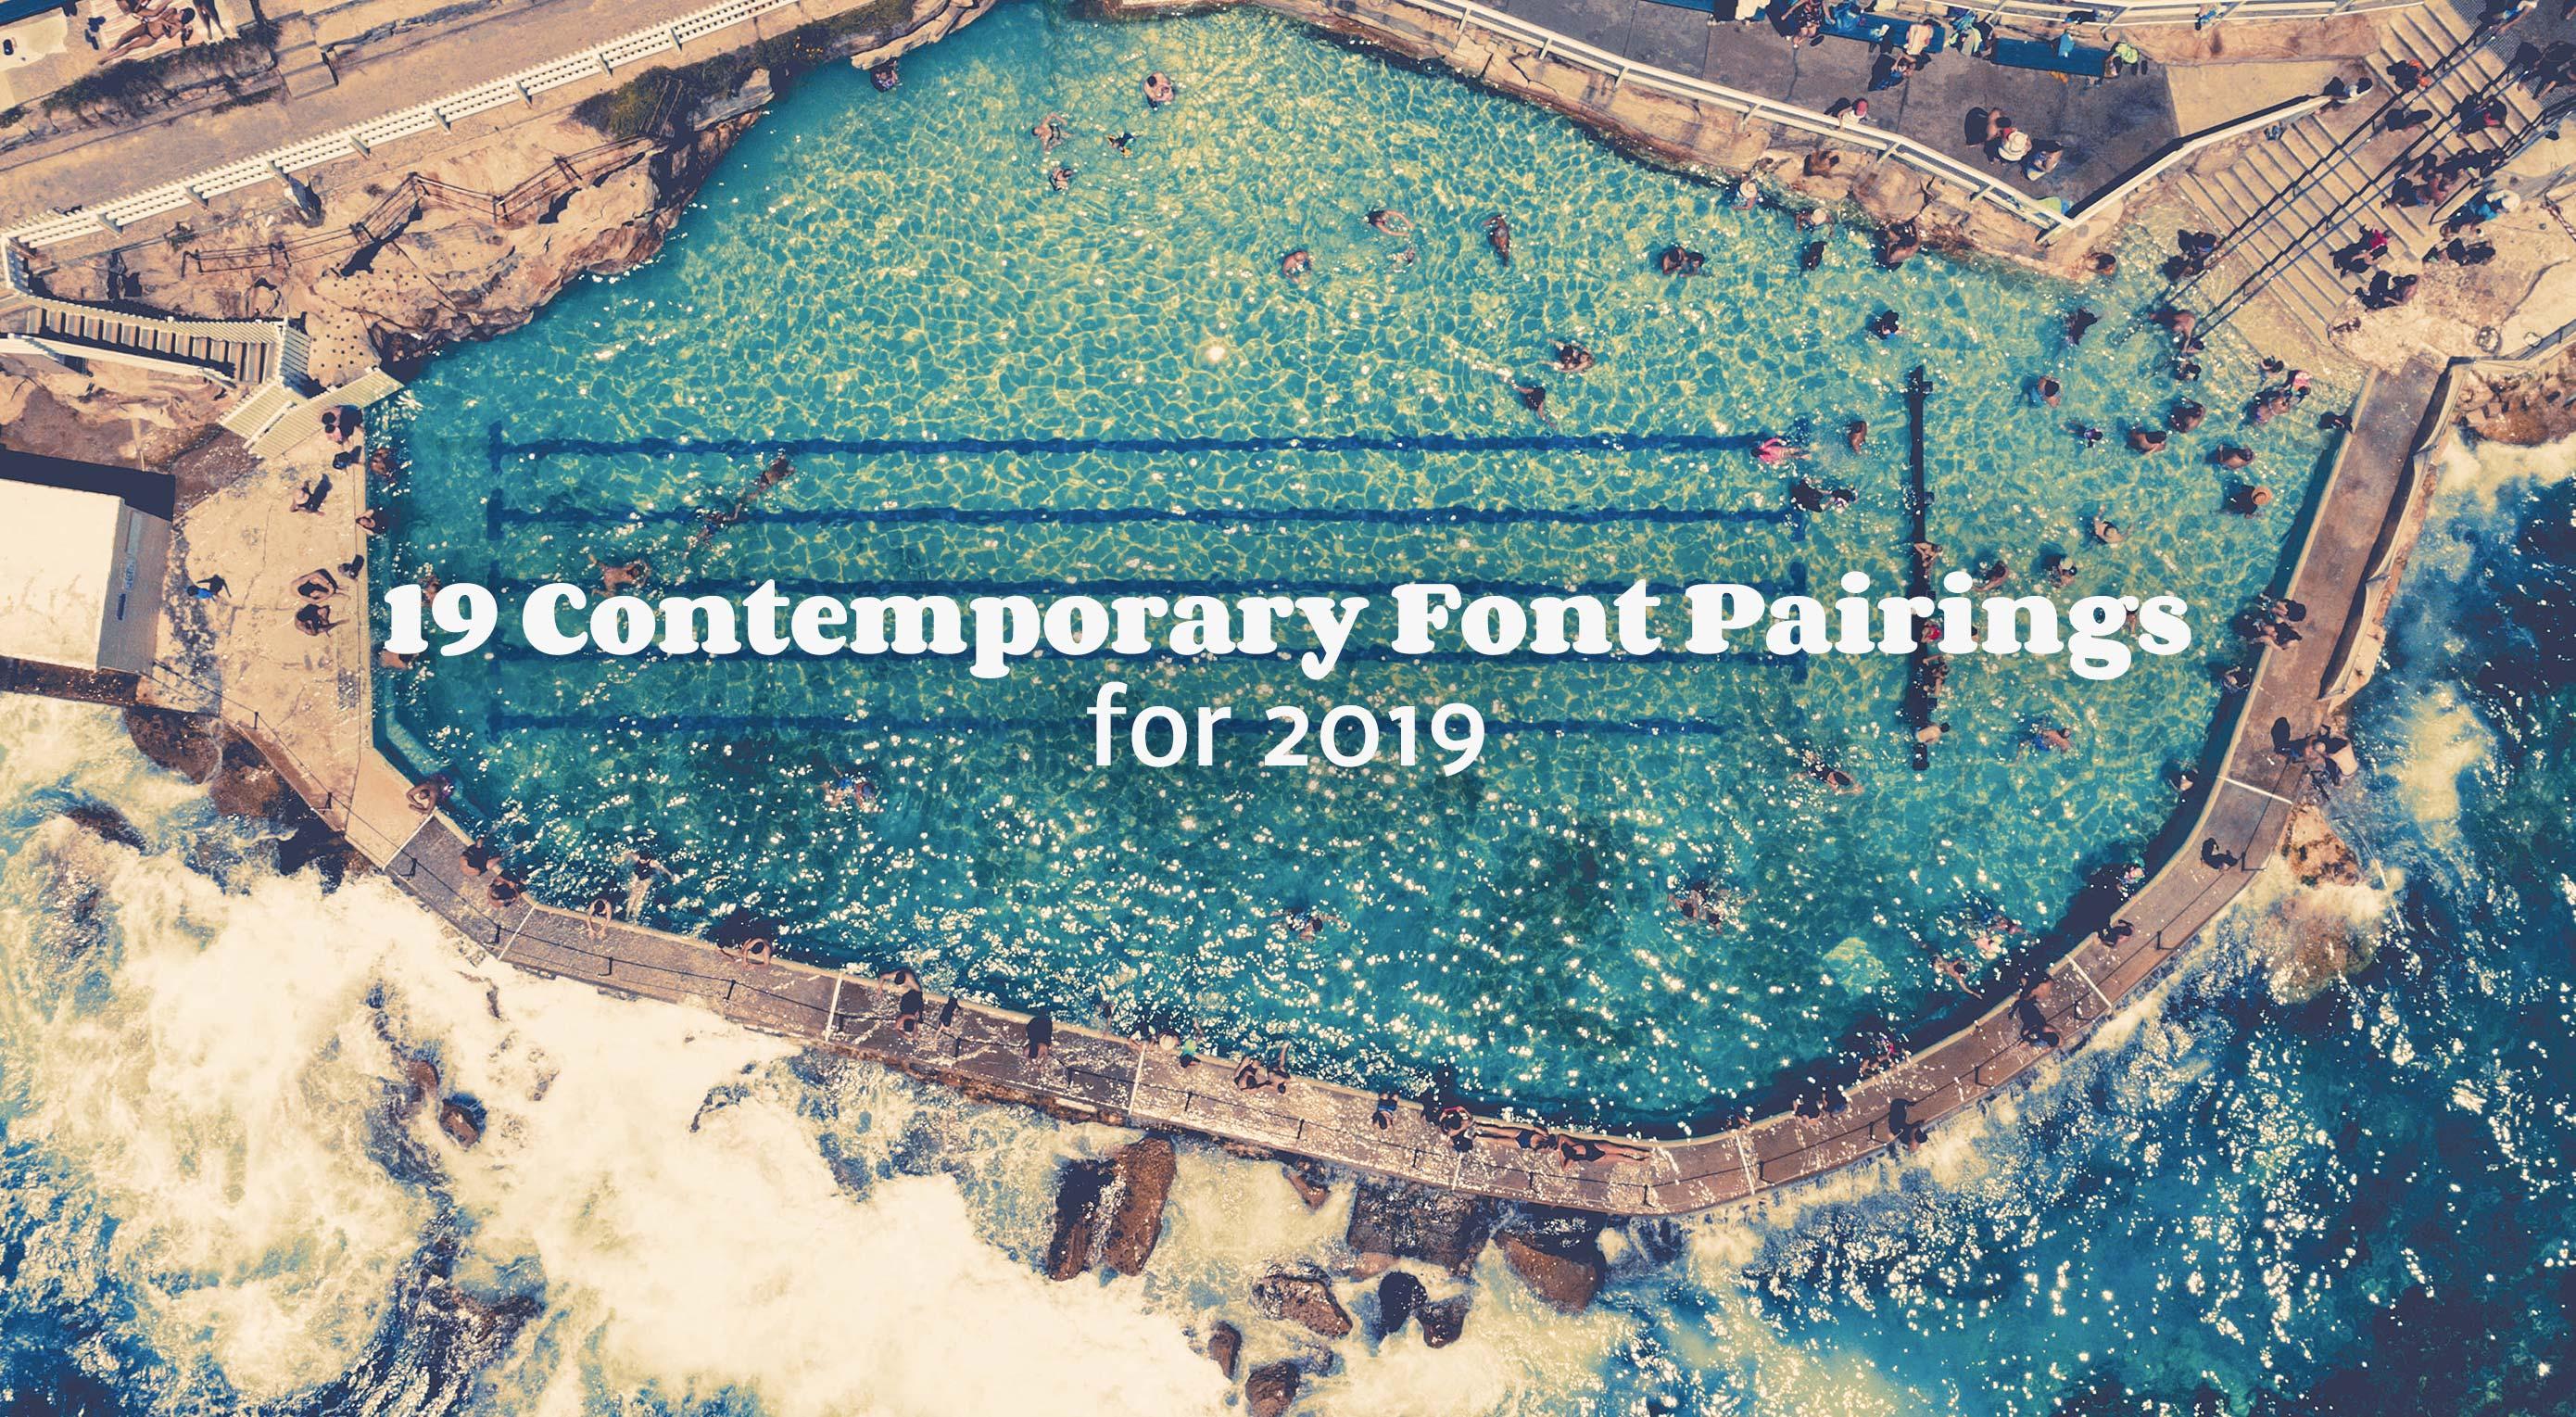 Best Font Pairings 2020 19 Contemporary Font Pairings for 2019 | Webdesigner Depot